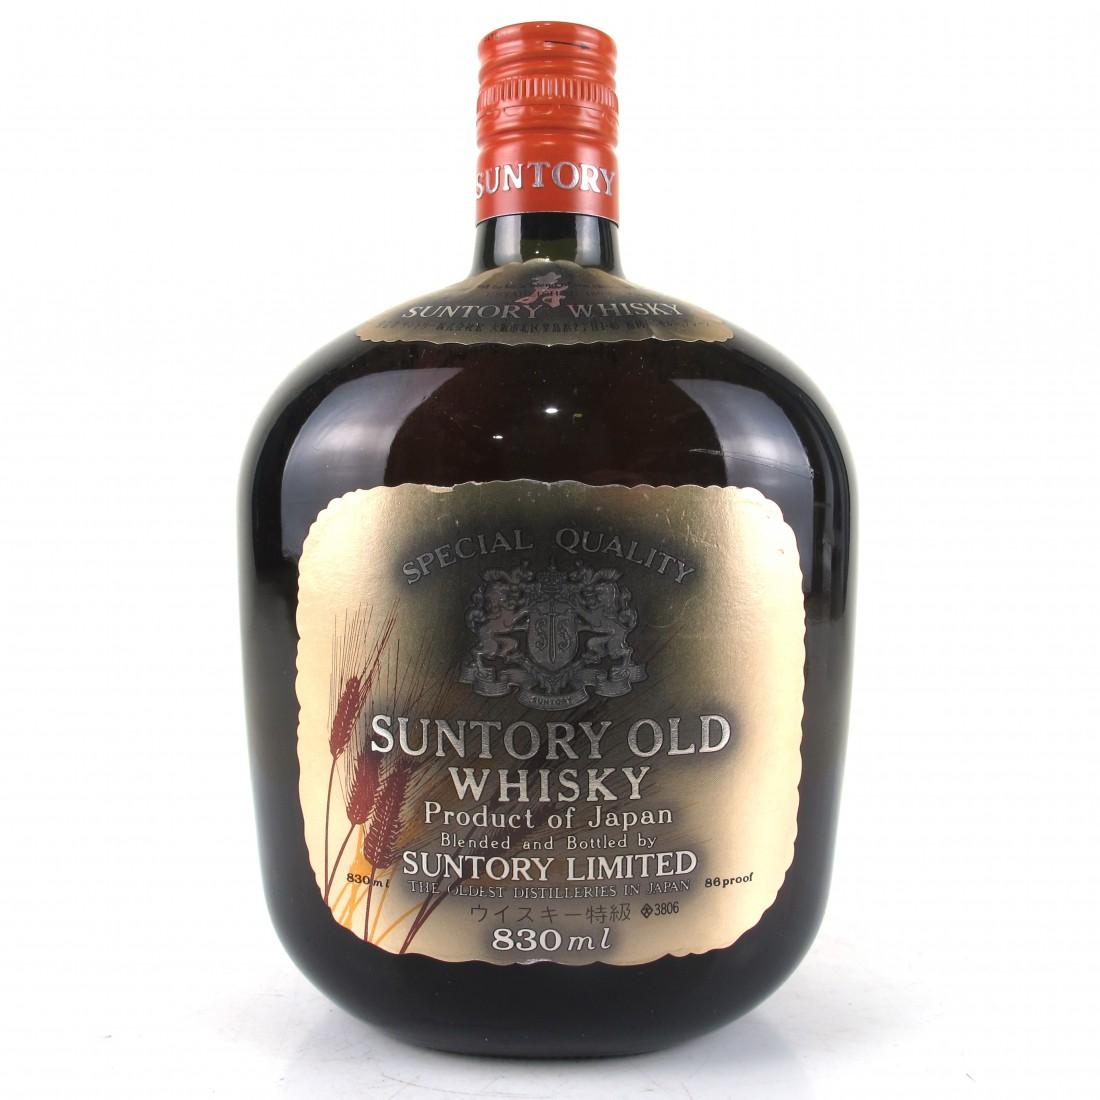 Suntory Old Whisky 83cl